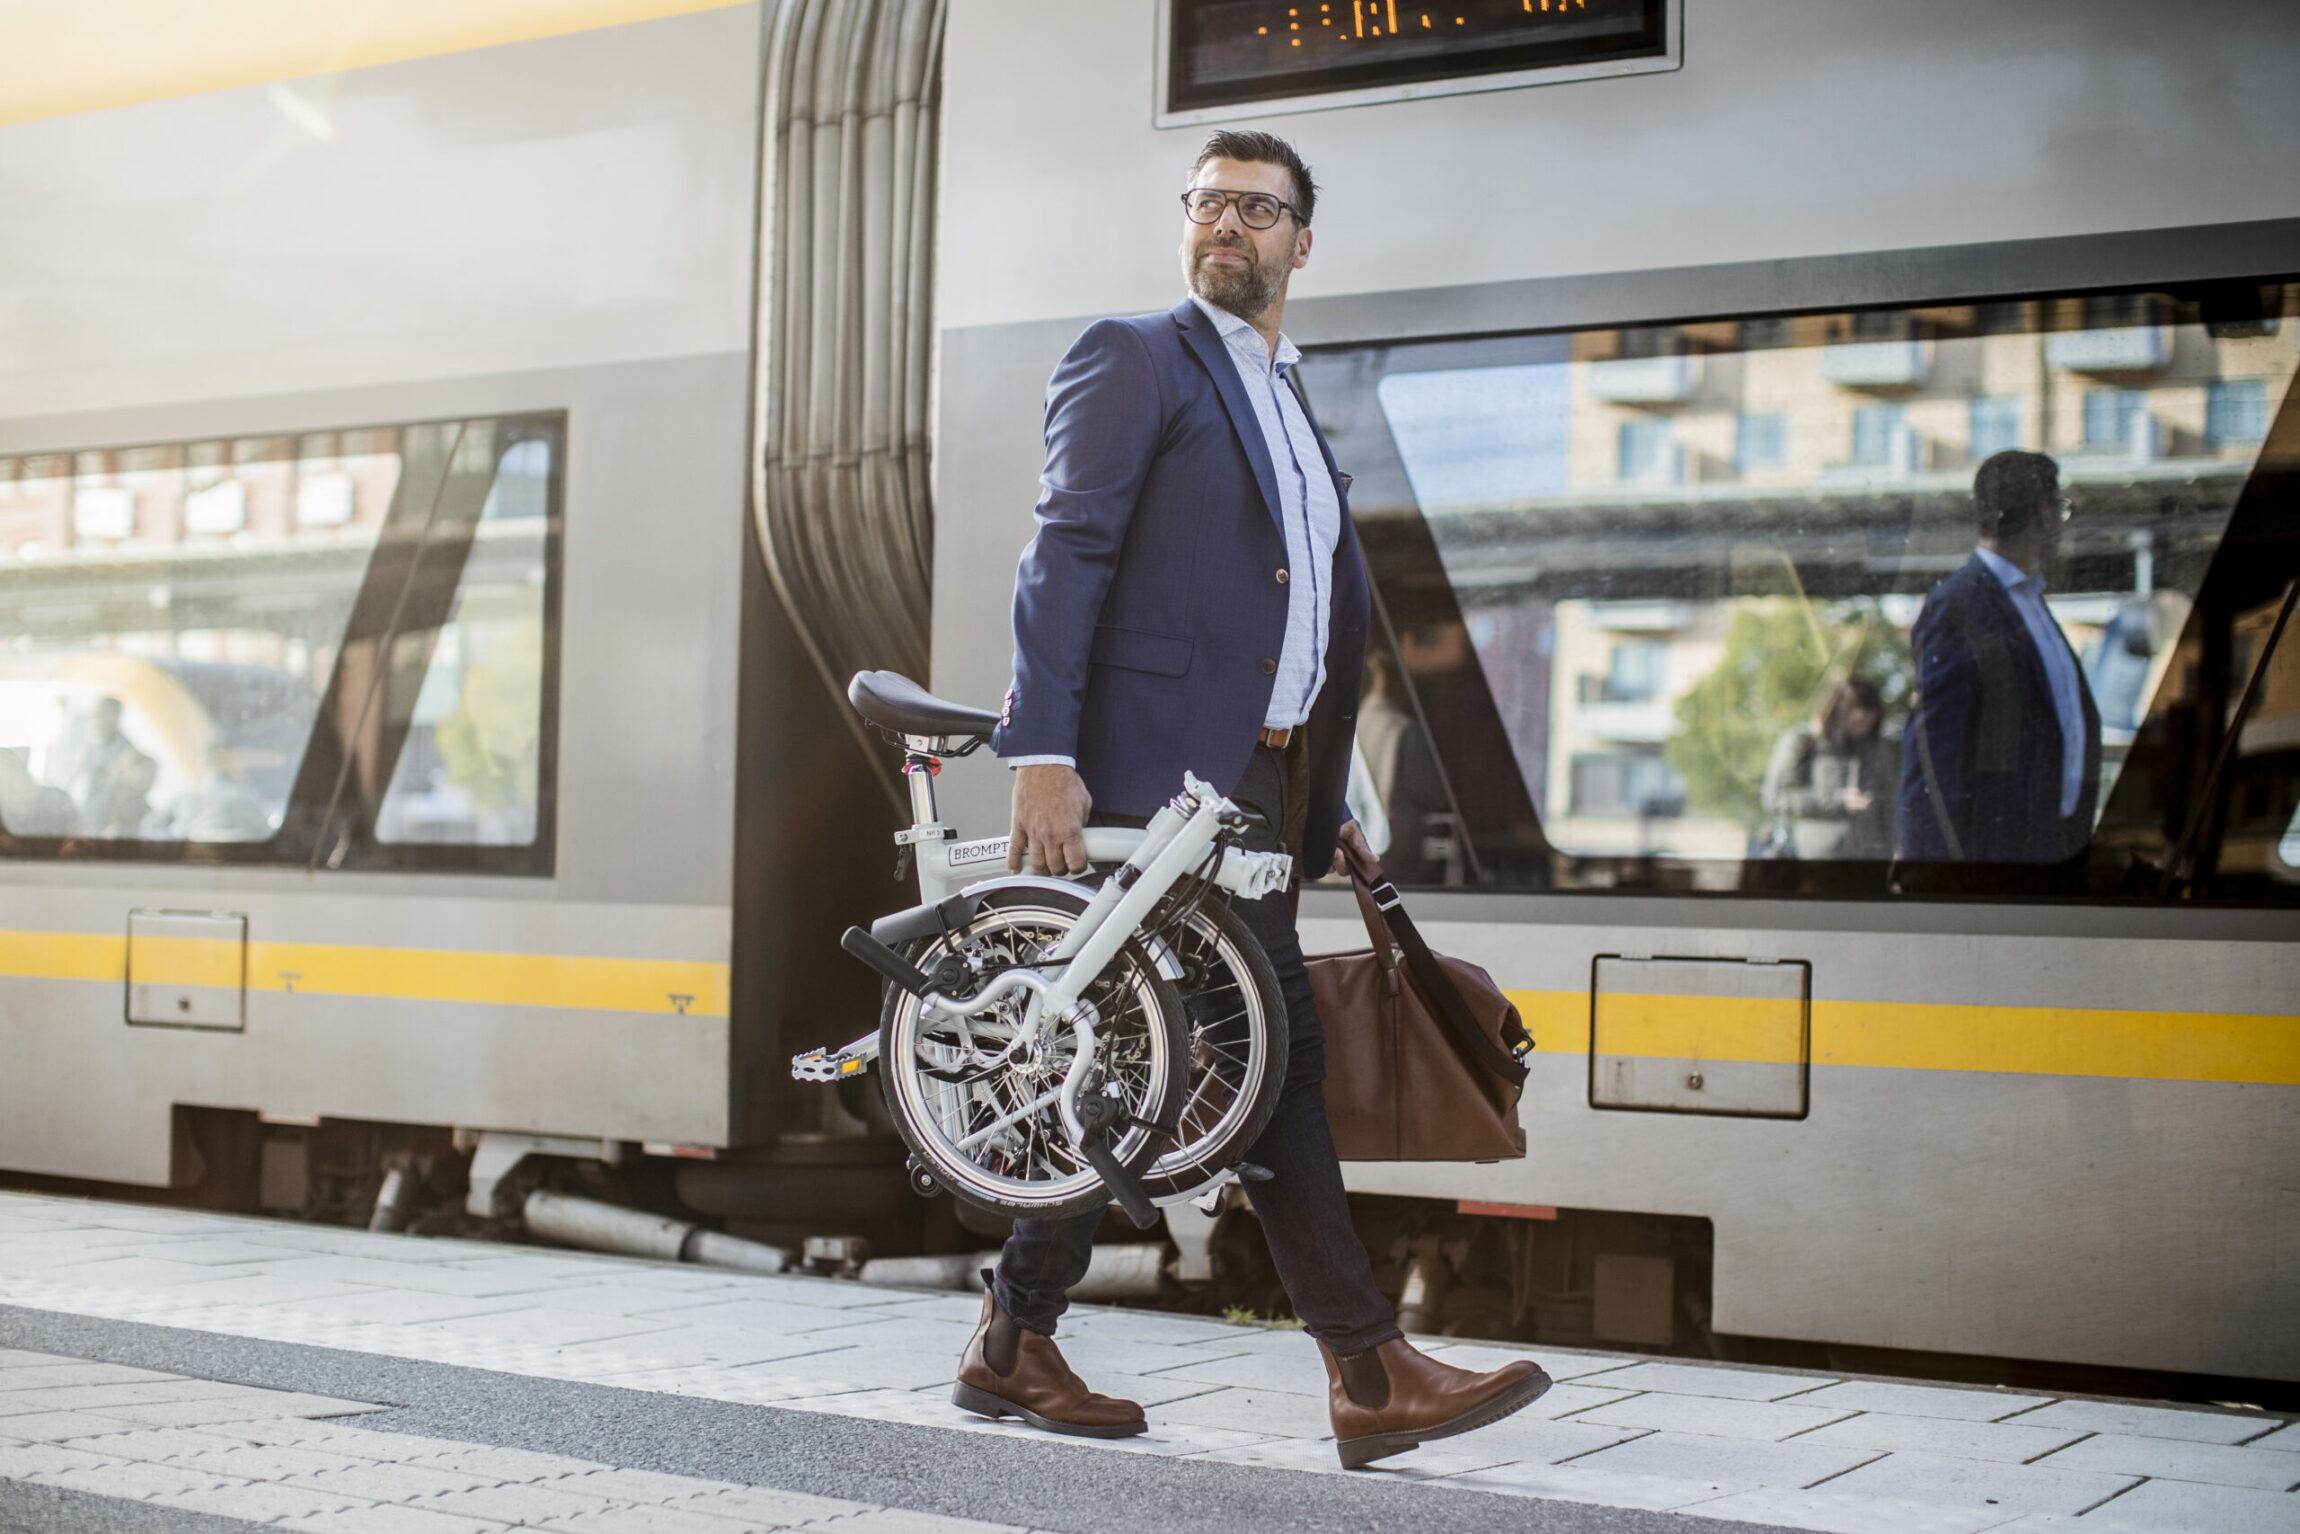 Bike test helps you make smart travel choices